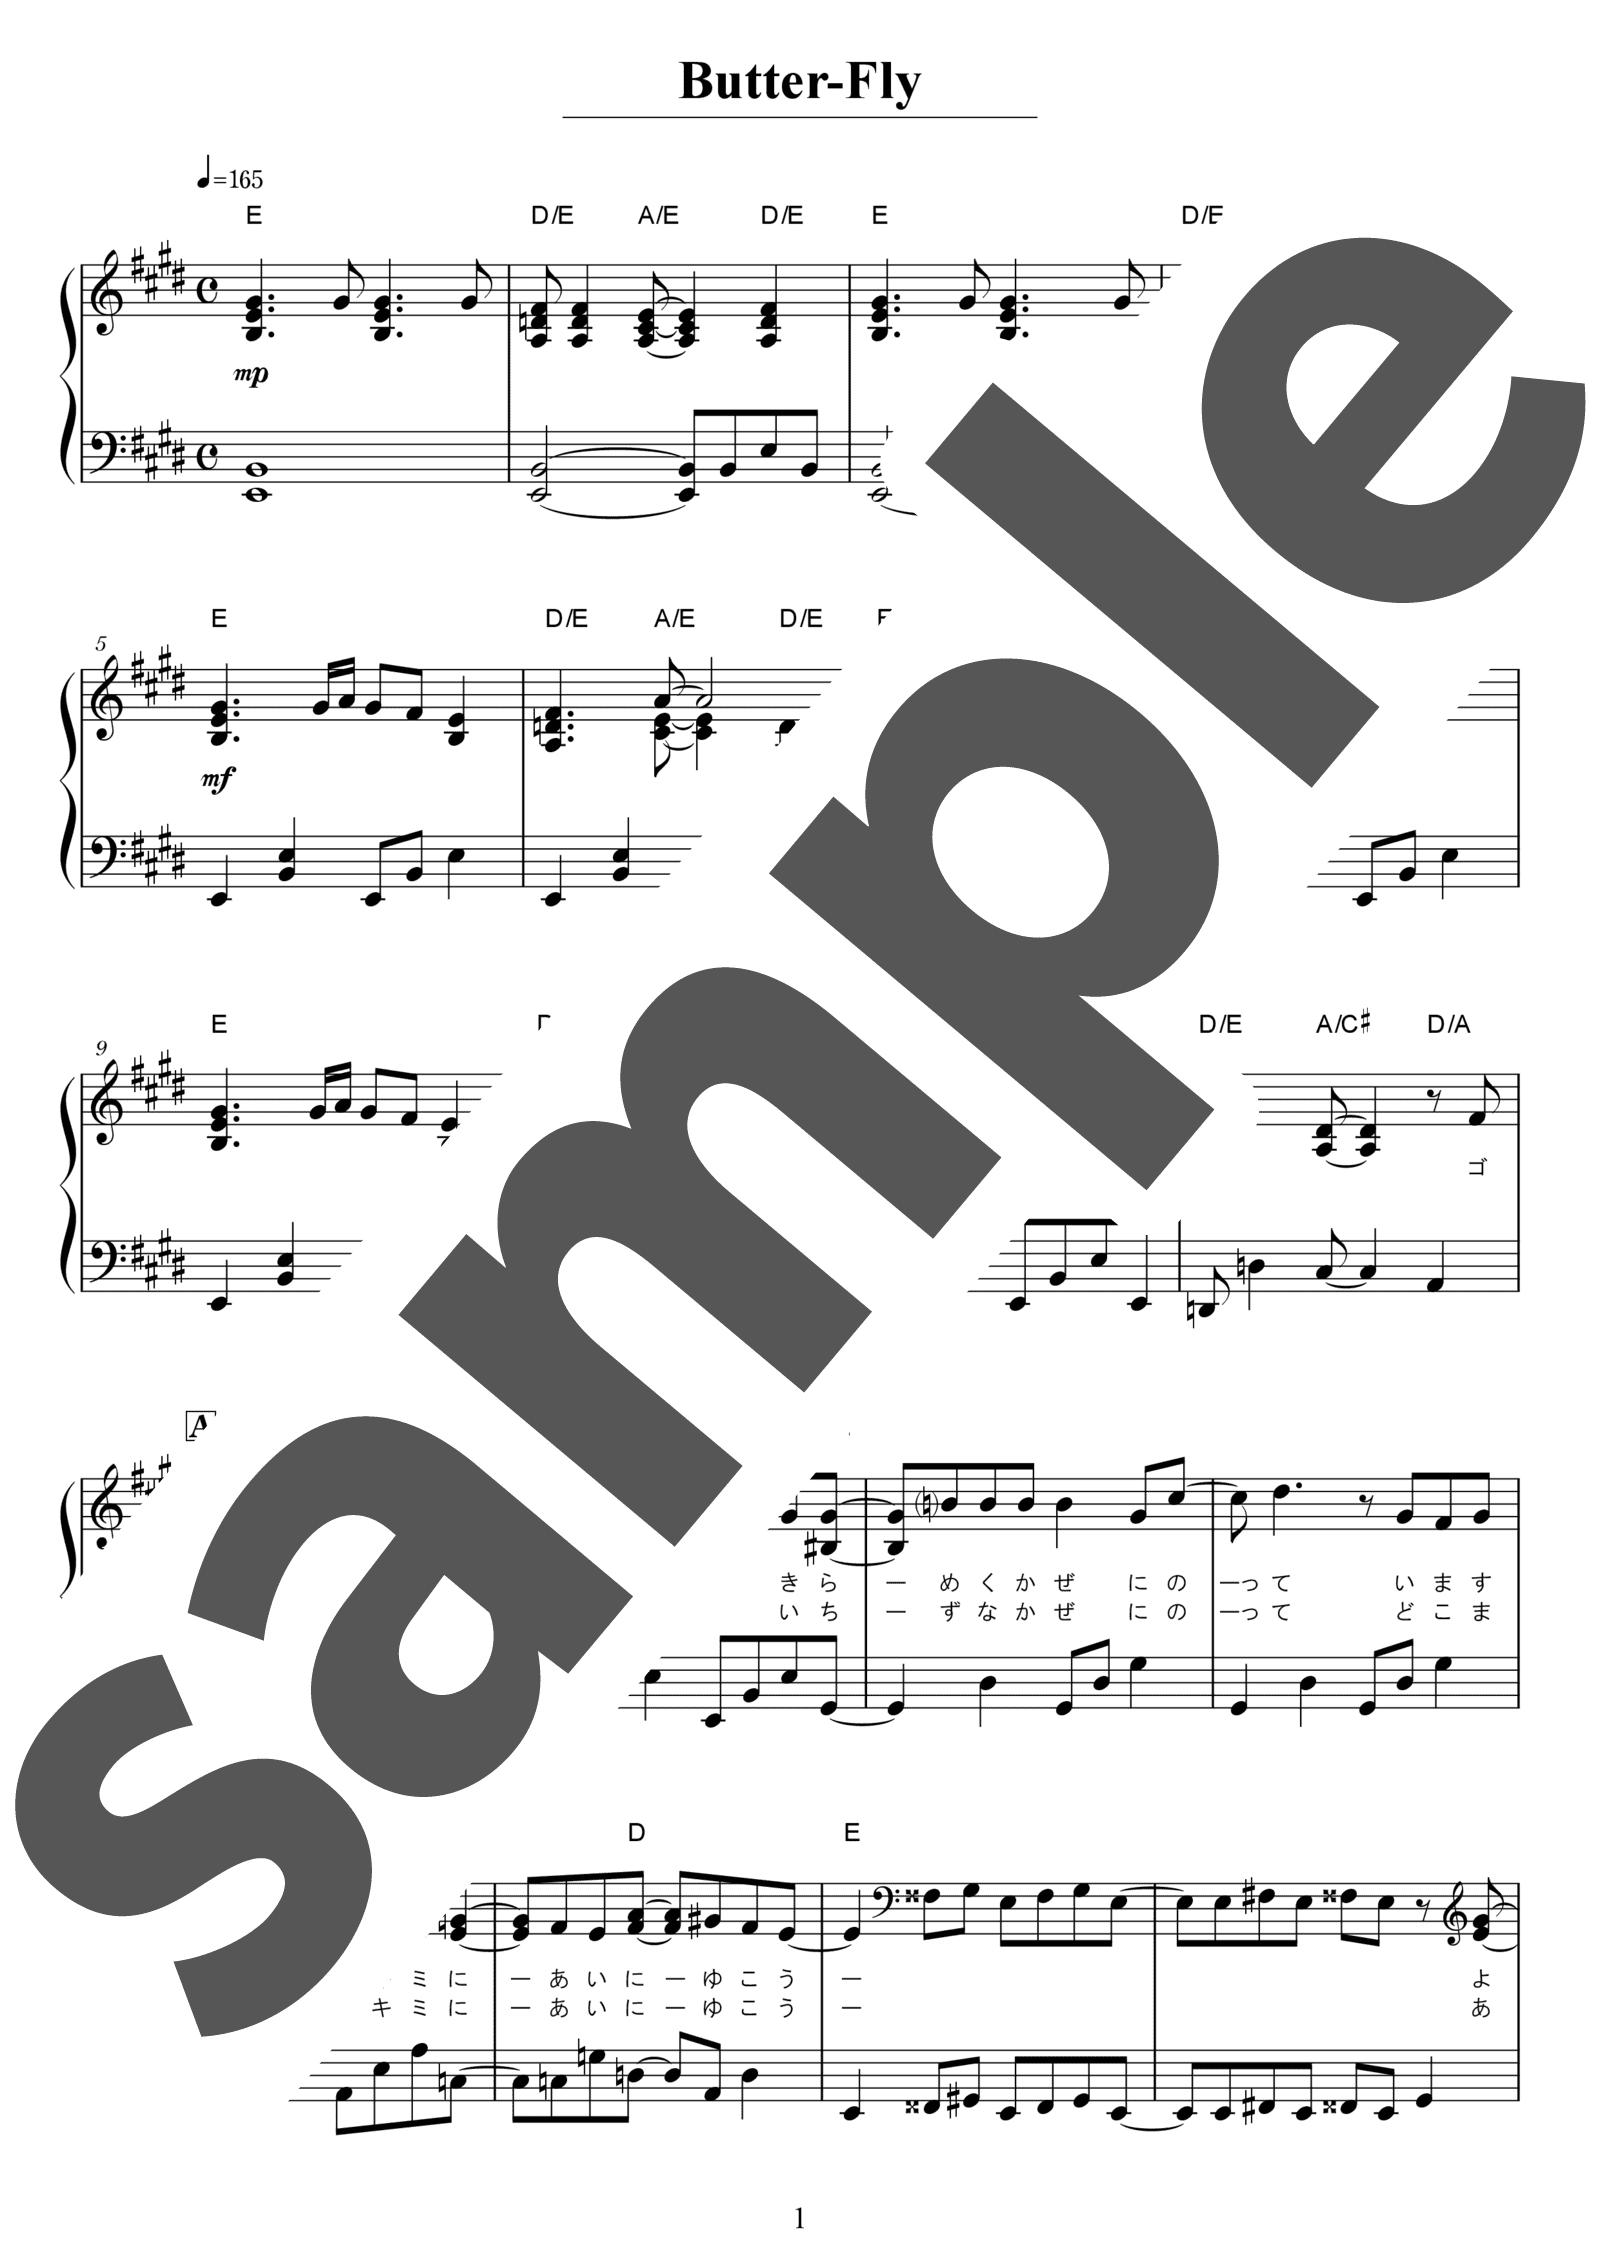 「Butter-Fly」のサンプル楽譜